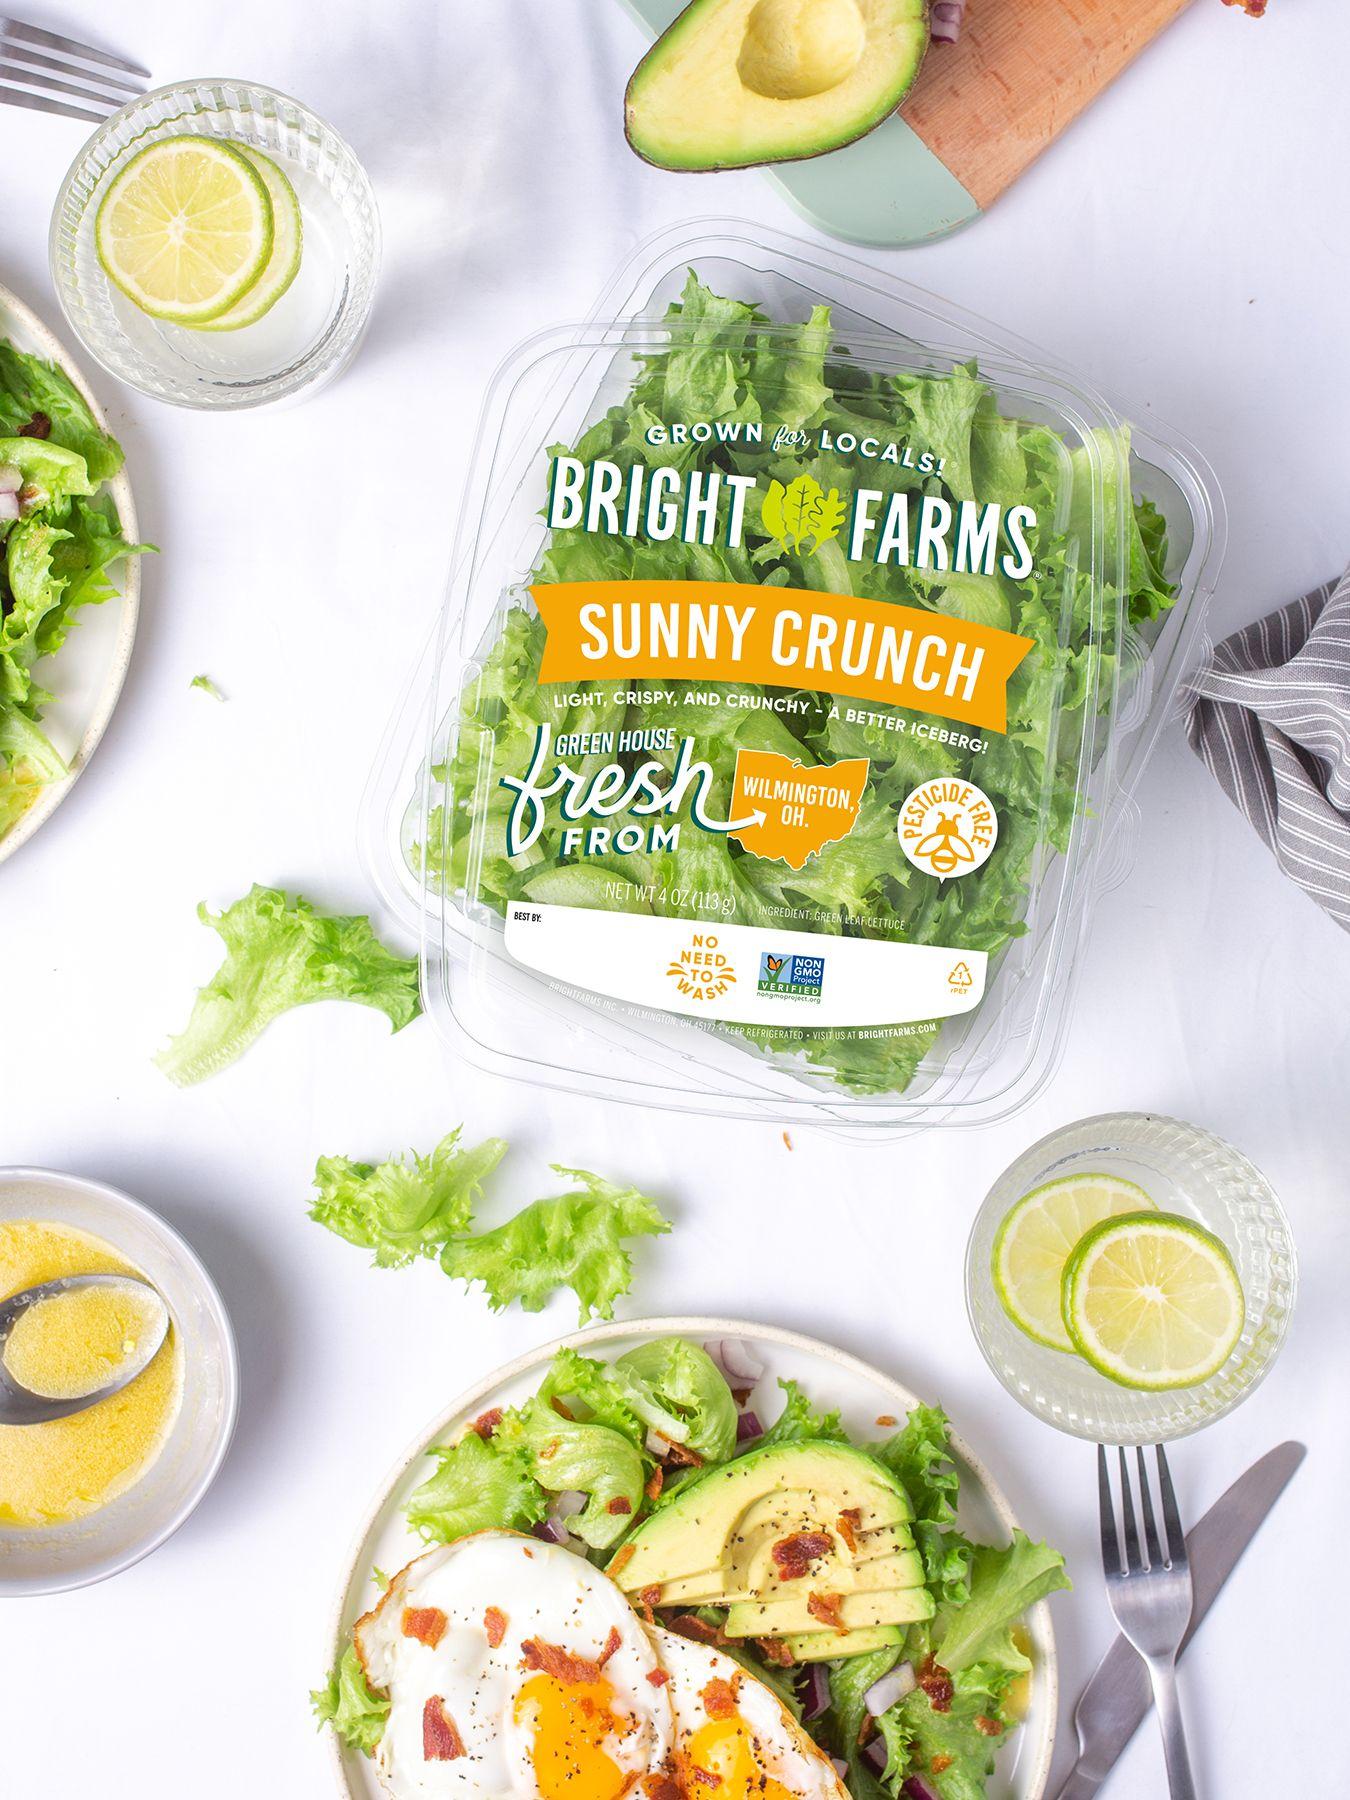 BrightFarms Sunny Crunch on Table | Crispy Green Leaf | Sunny Side Up Salad | A Better Iceberg